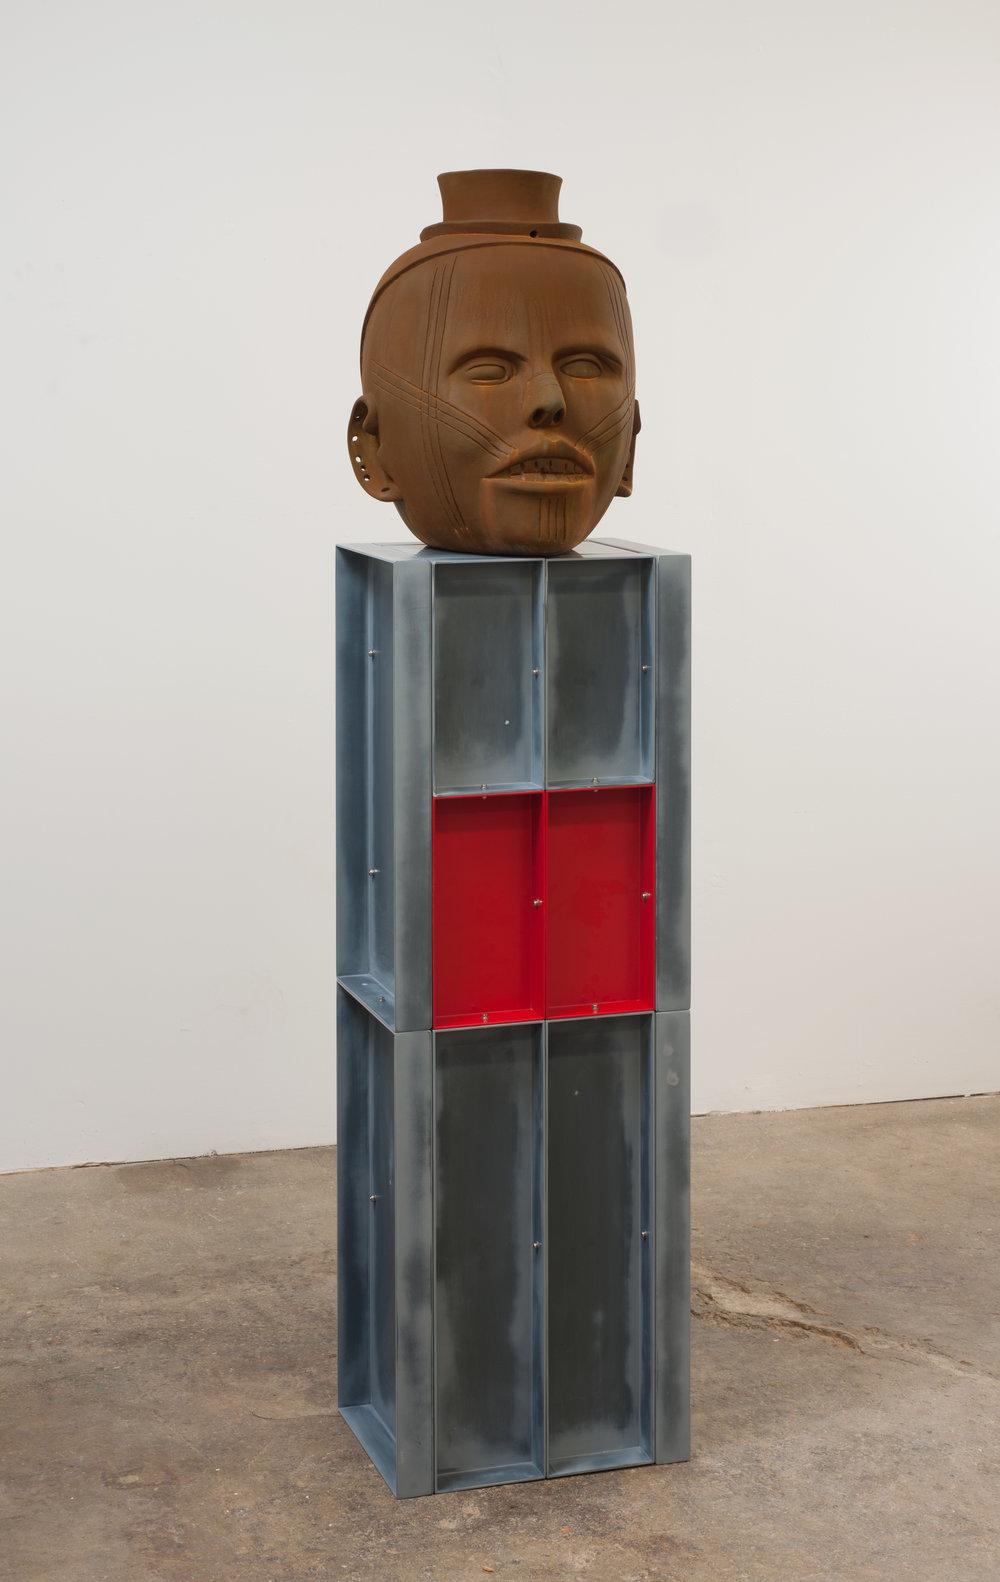 400% (Death Grin/Picabia Face), 2010 terracotta, aluminum, paint 175 x 40 x 30 cm - 68 7/8 x 15 3/4 x 11 3/4 inches